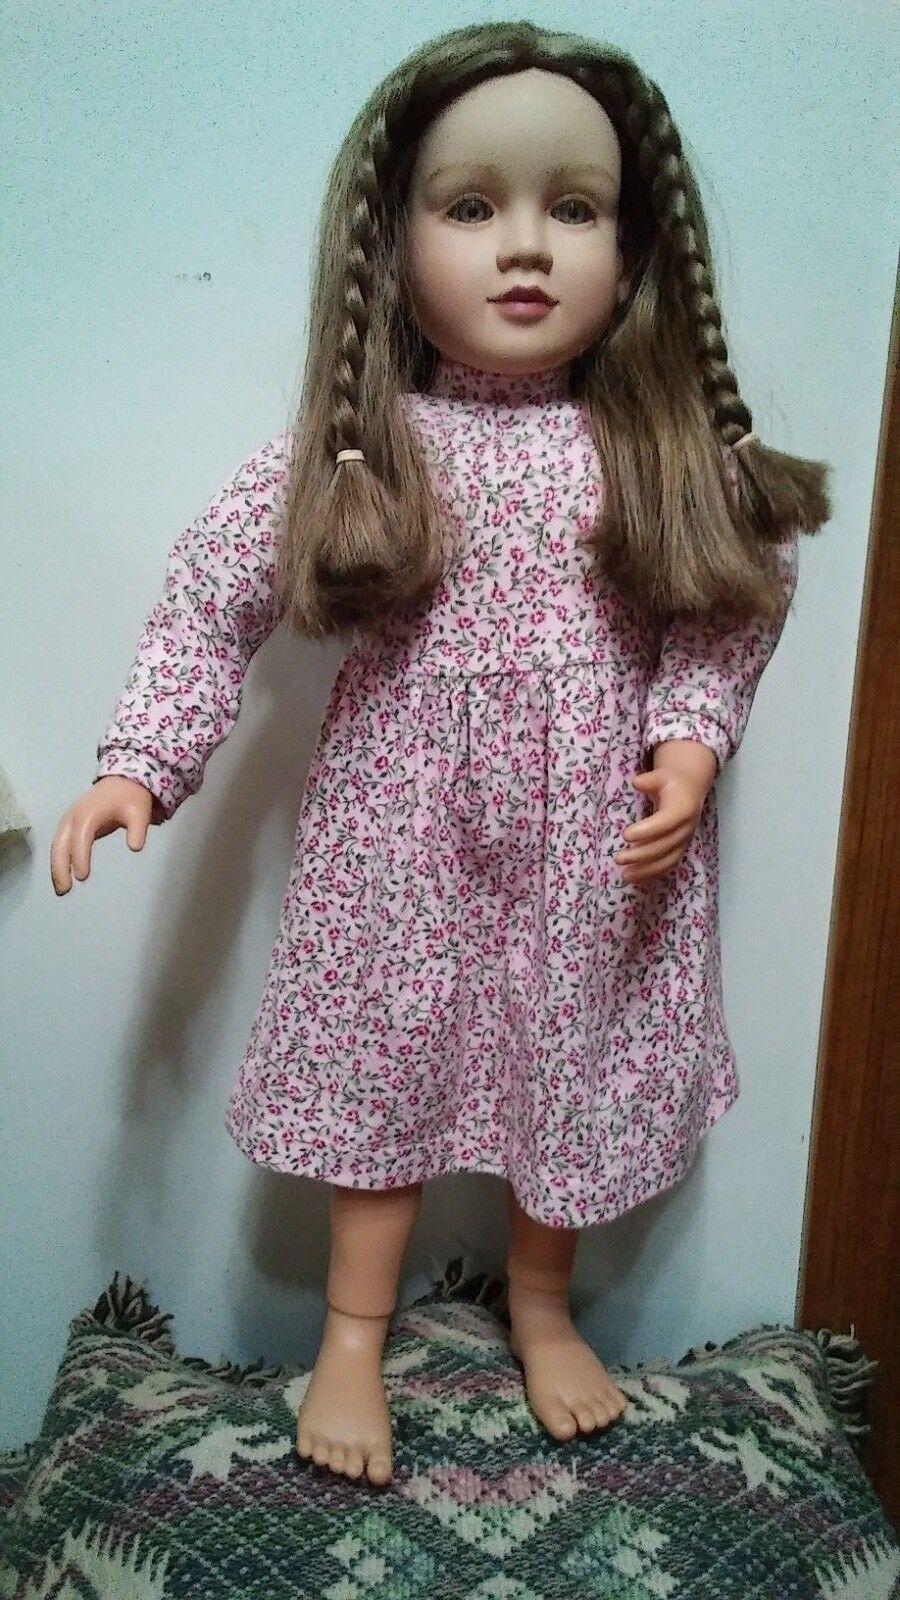 Mi Twinn Muñeca cabello largo marrón claro ojos castaños 1996 23  De Alto